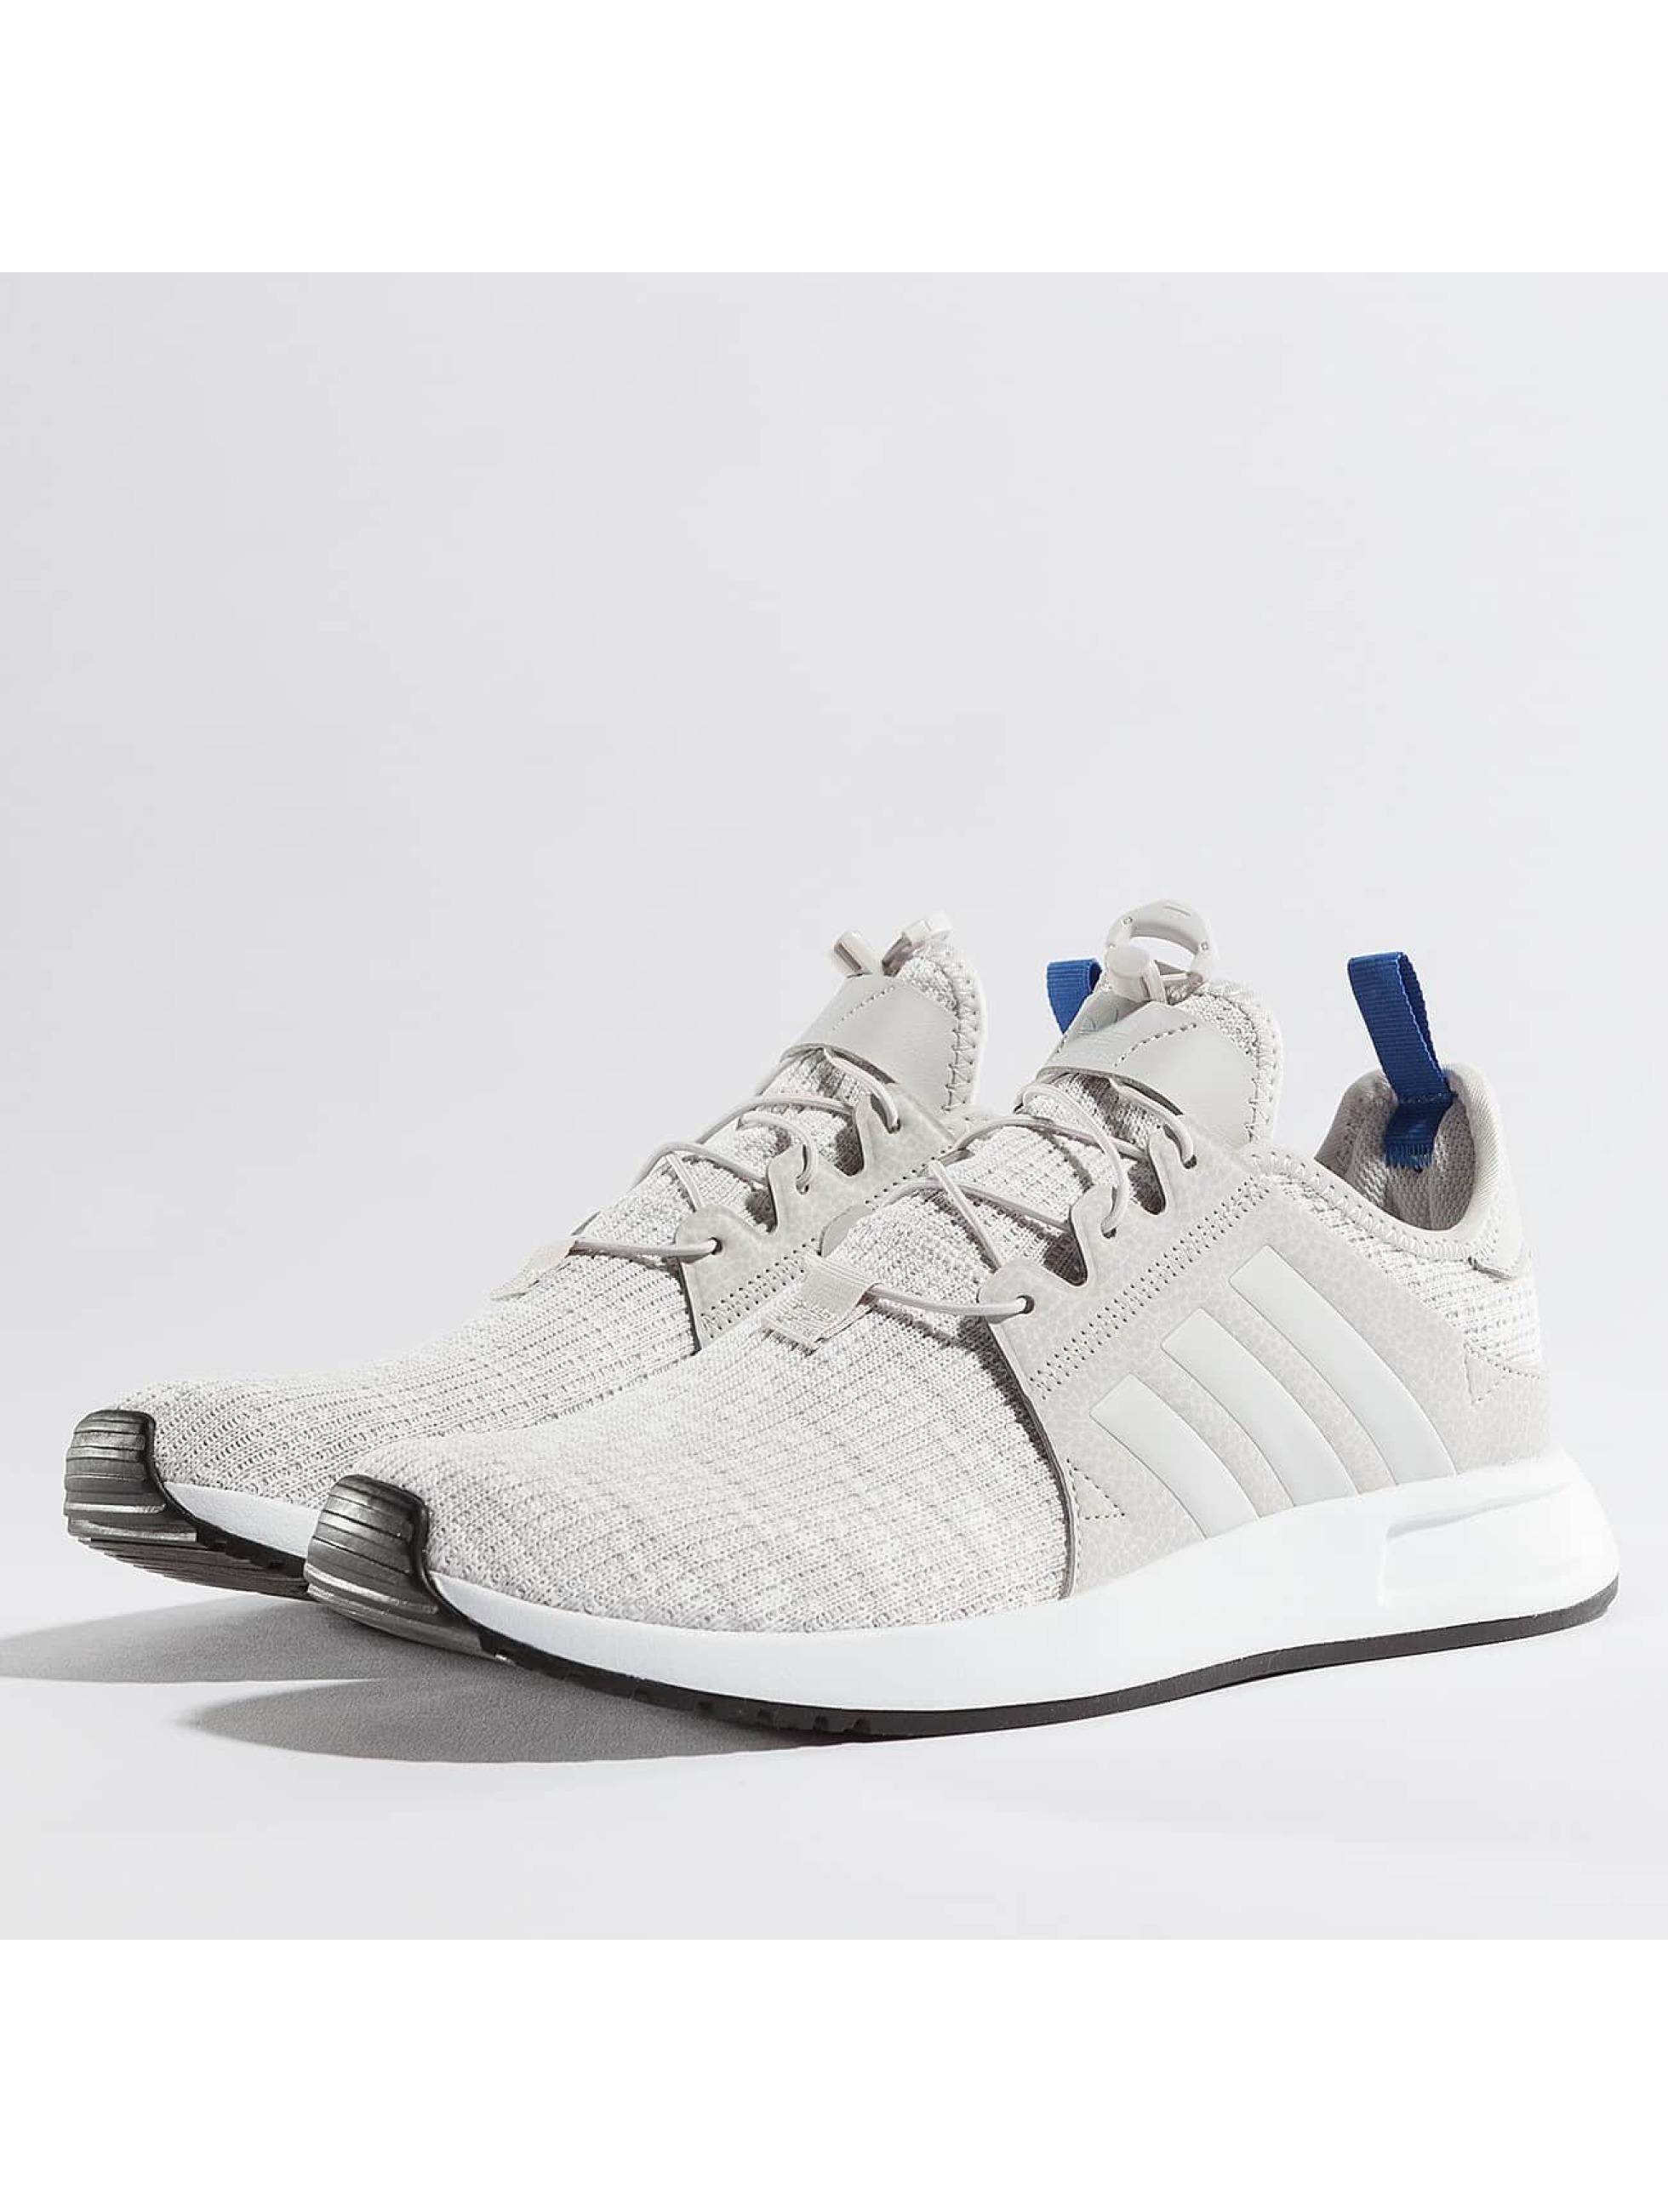 Image Result For Urban Sneaker Society